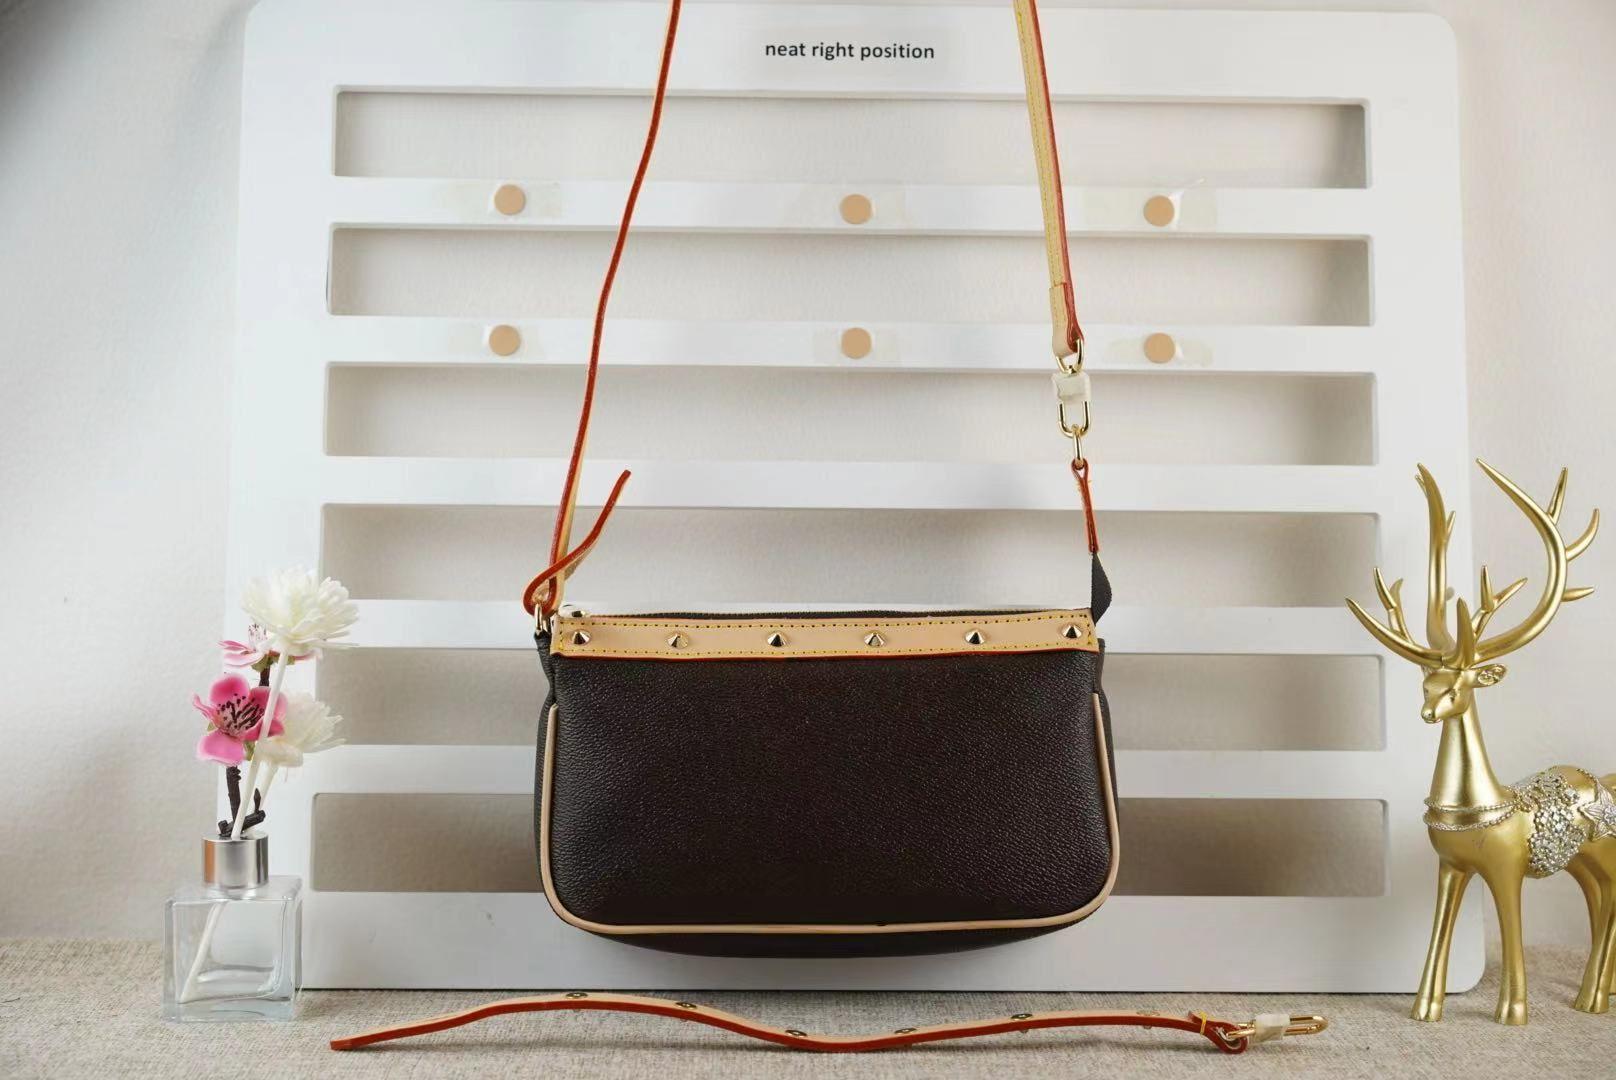 2020 Moda Luxo Elegante Corrente Designer Crossbody Tote Bolsa De Ombro Para Mulheres Novos Luxo Designer Bolsas Senhoras Cross Body Body Vintage Bag